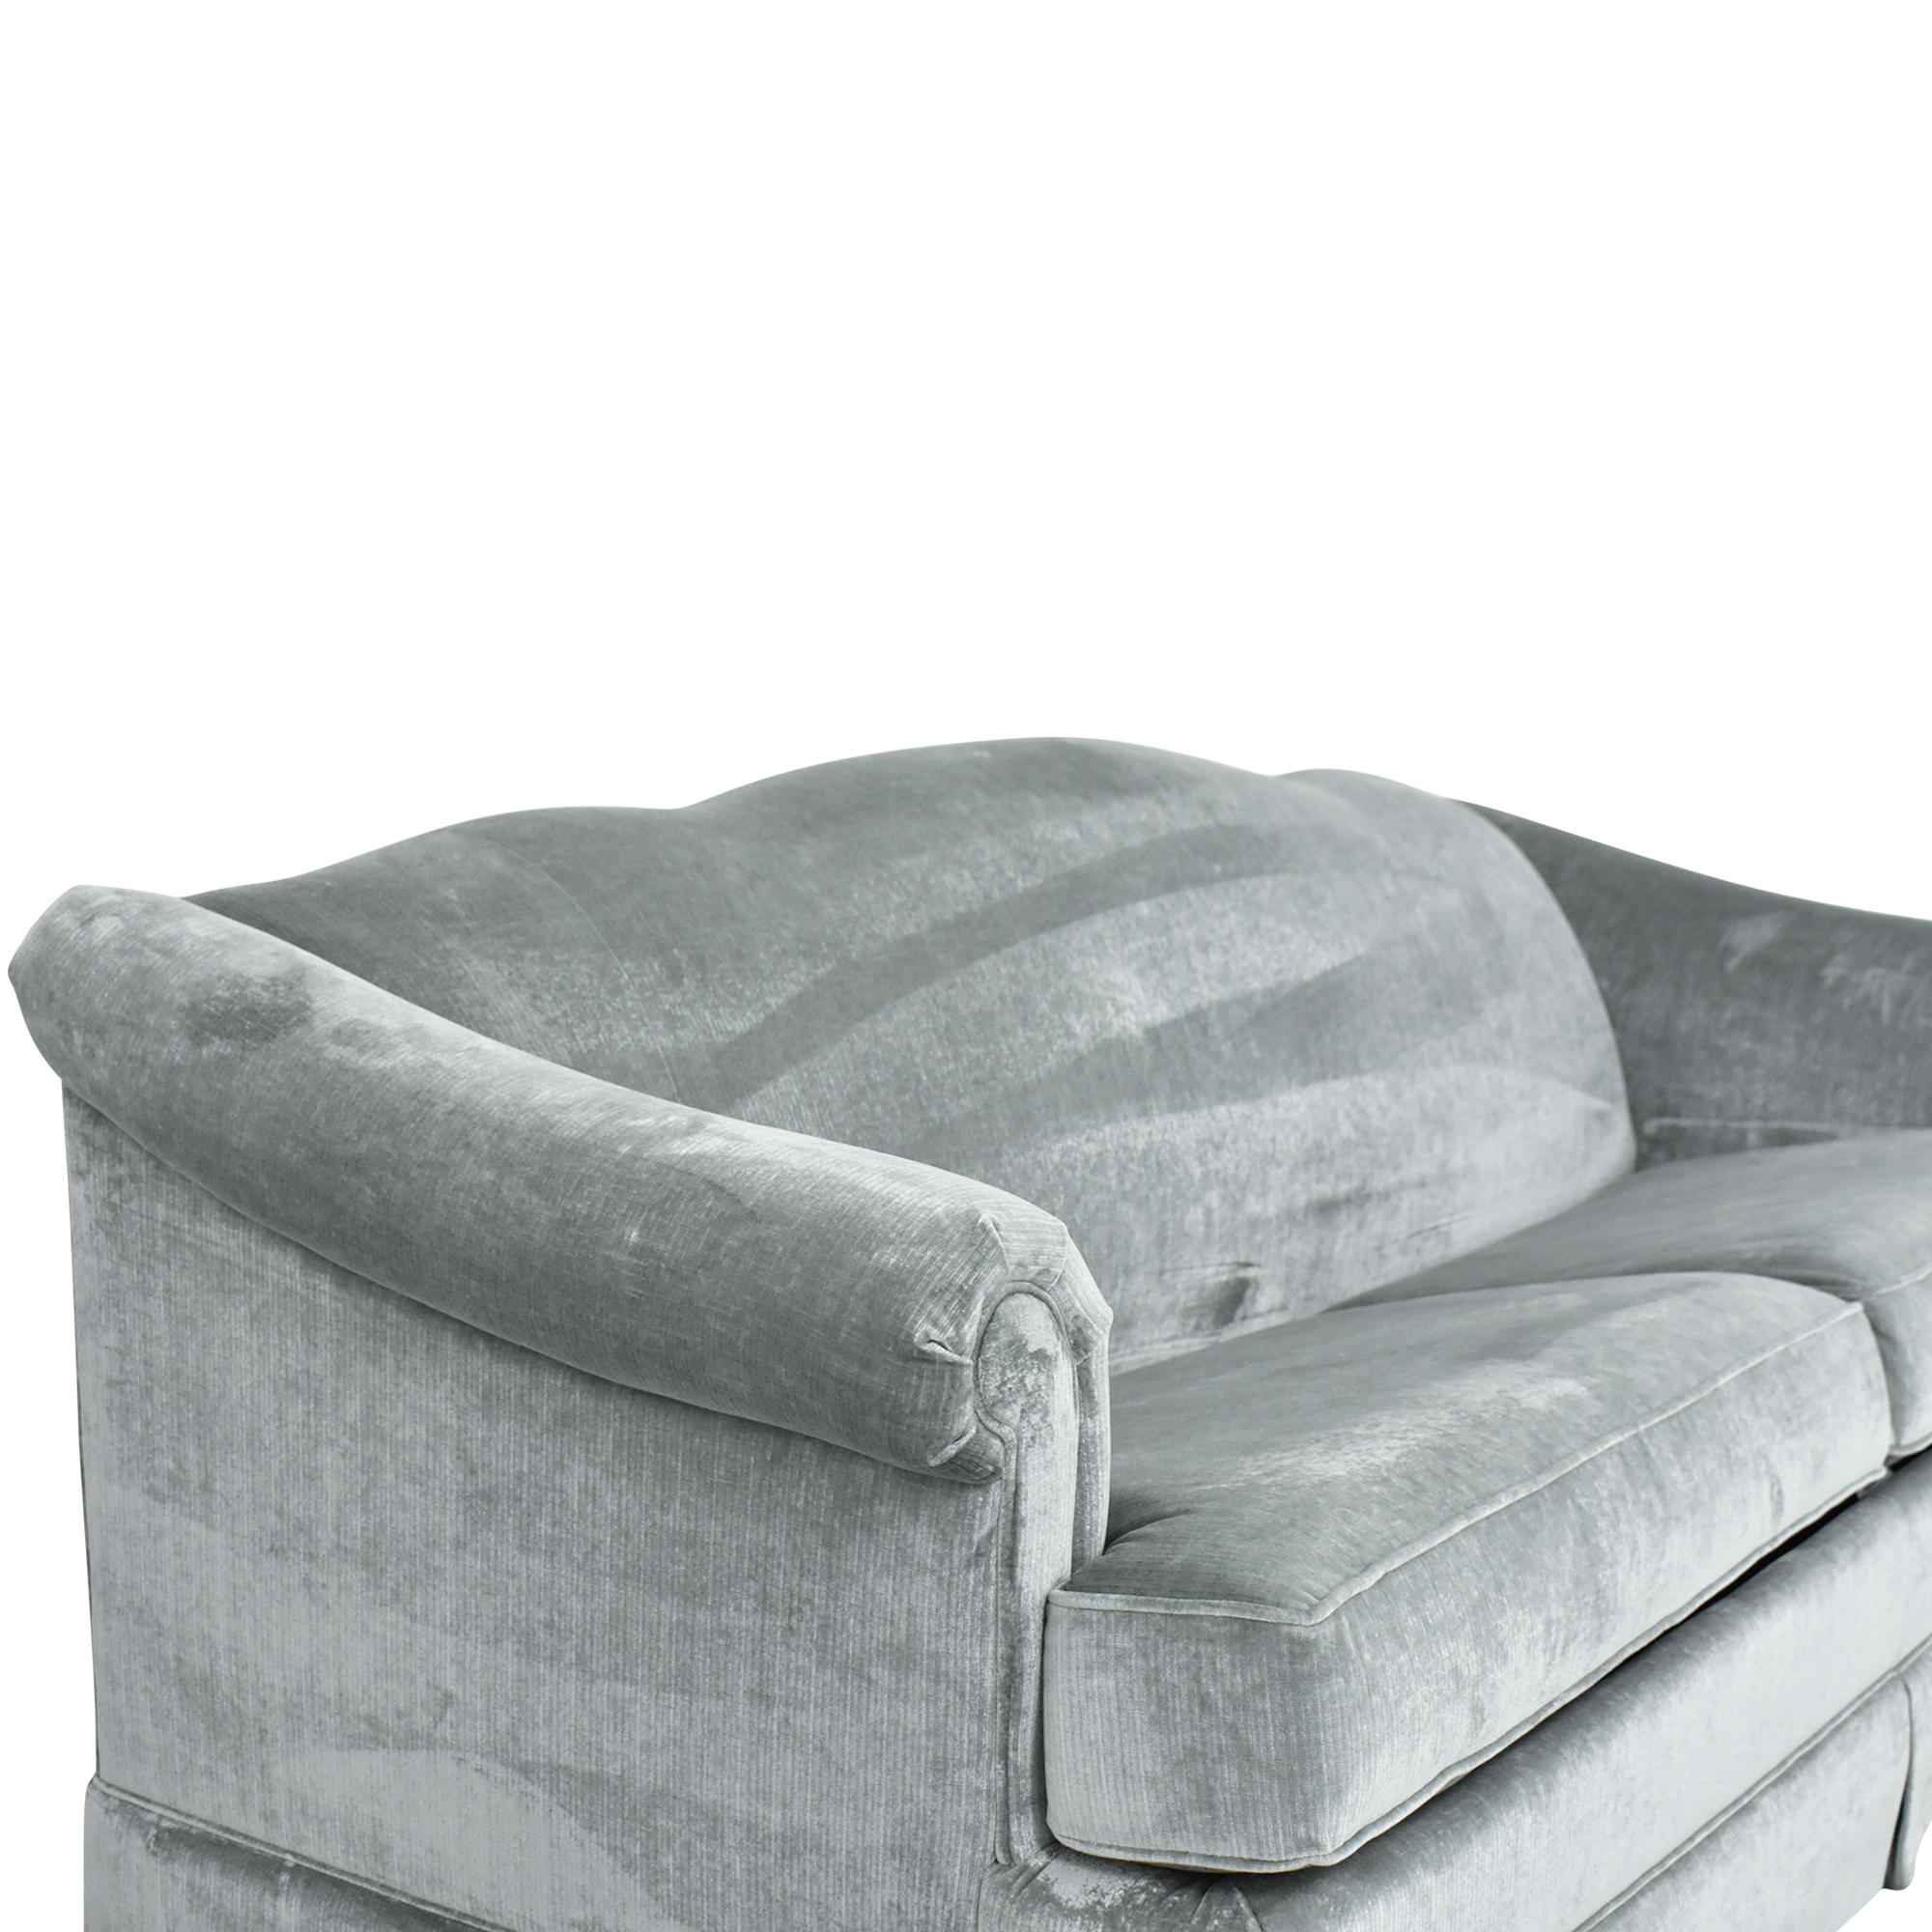 Thomasville Maribel Sleeper Sofa sale